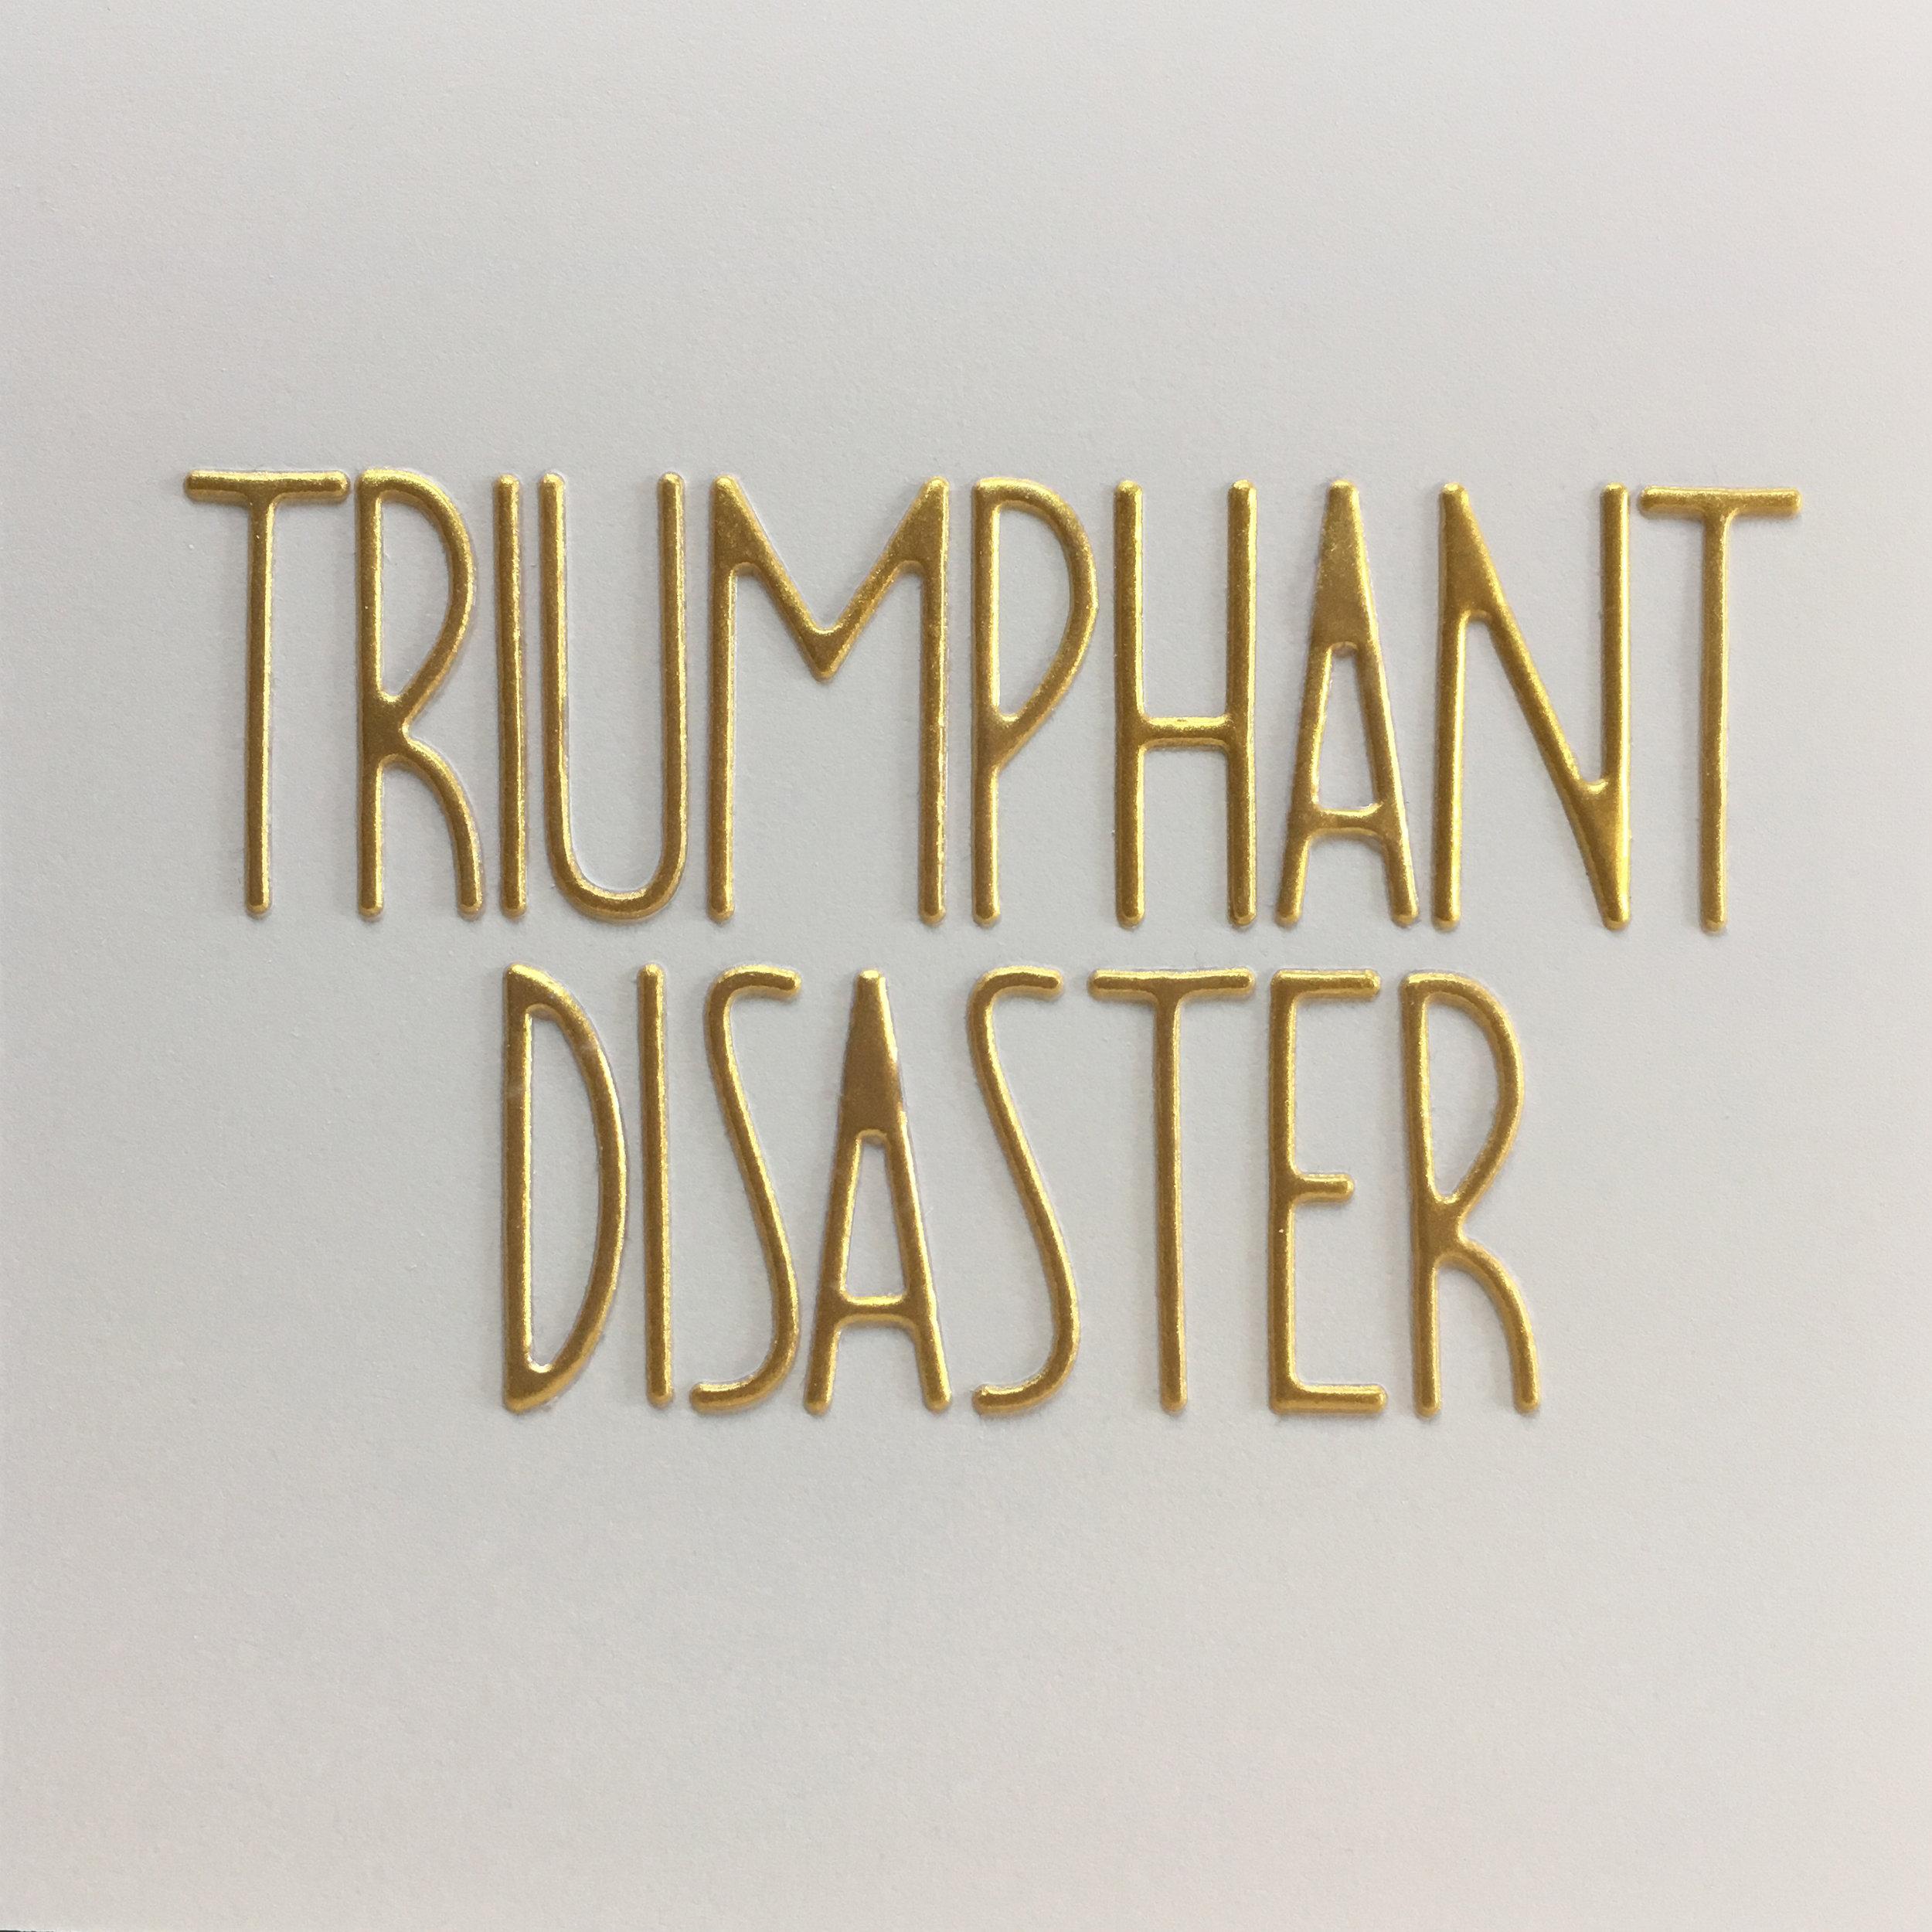 triumphant disaster.jpg